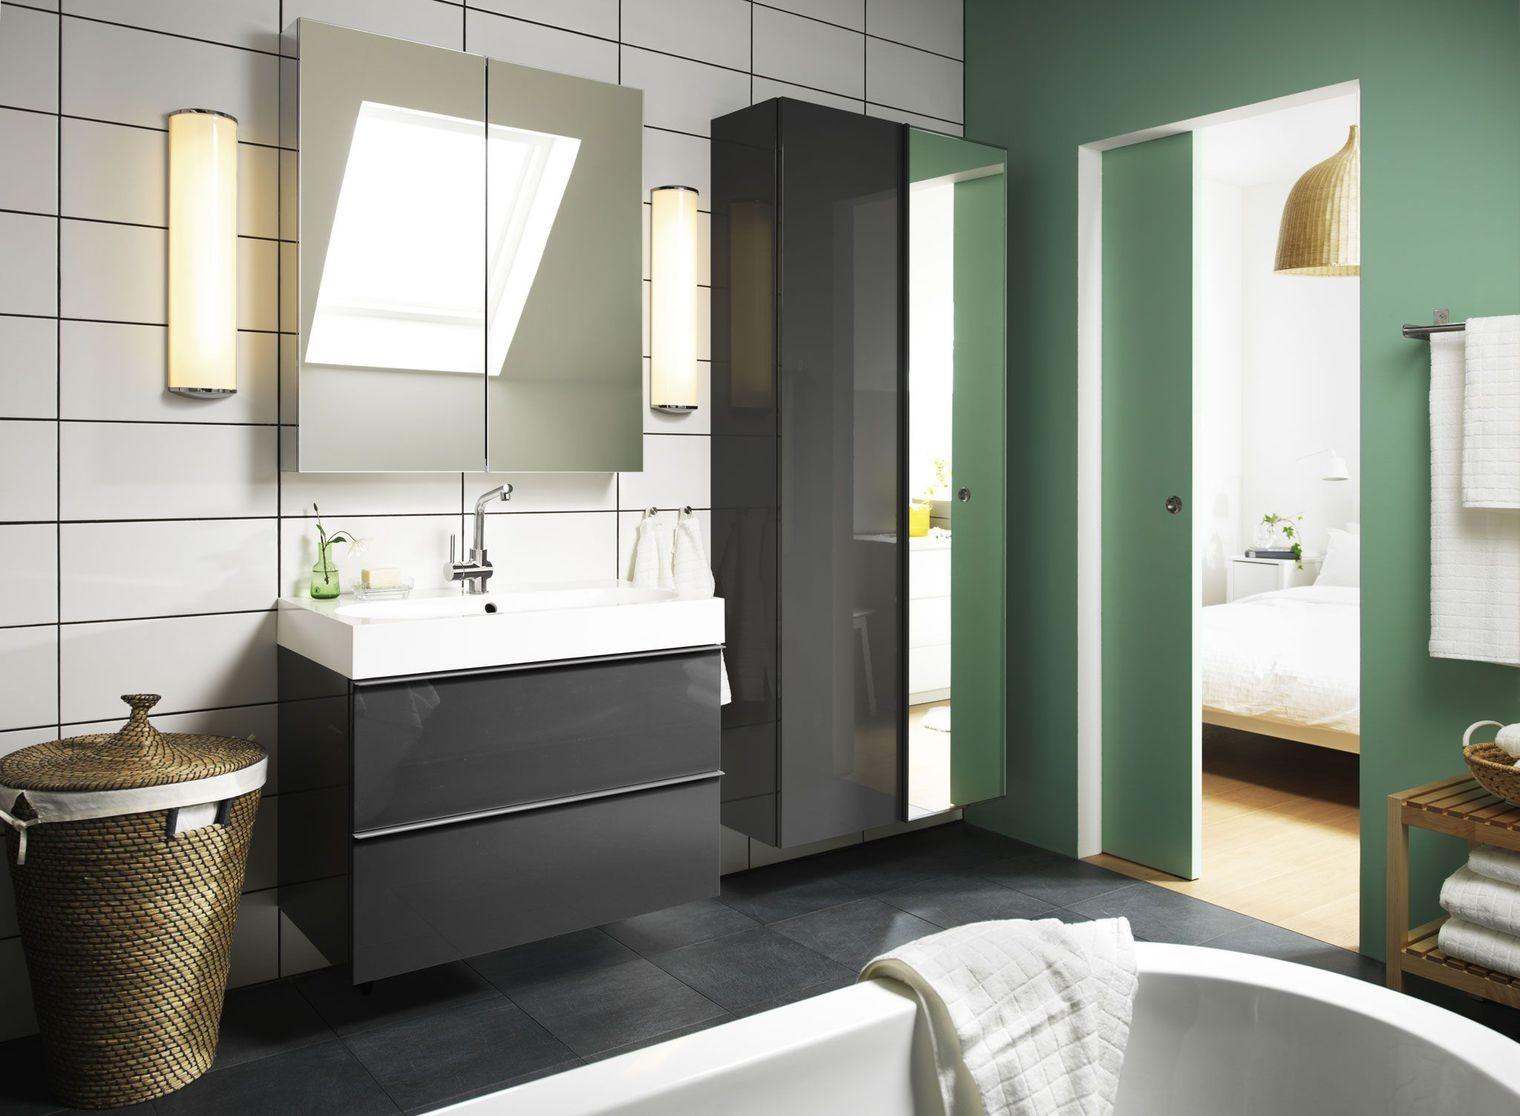 Armoire salle de bain ikea armoire id es de d coration for Armoire de salle de bain